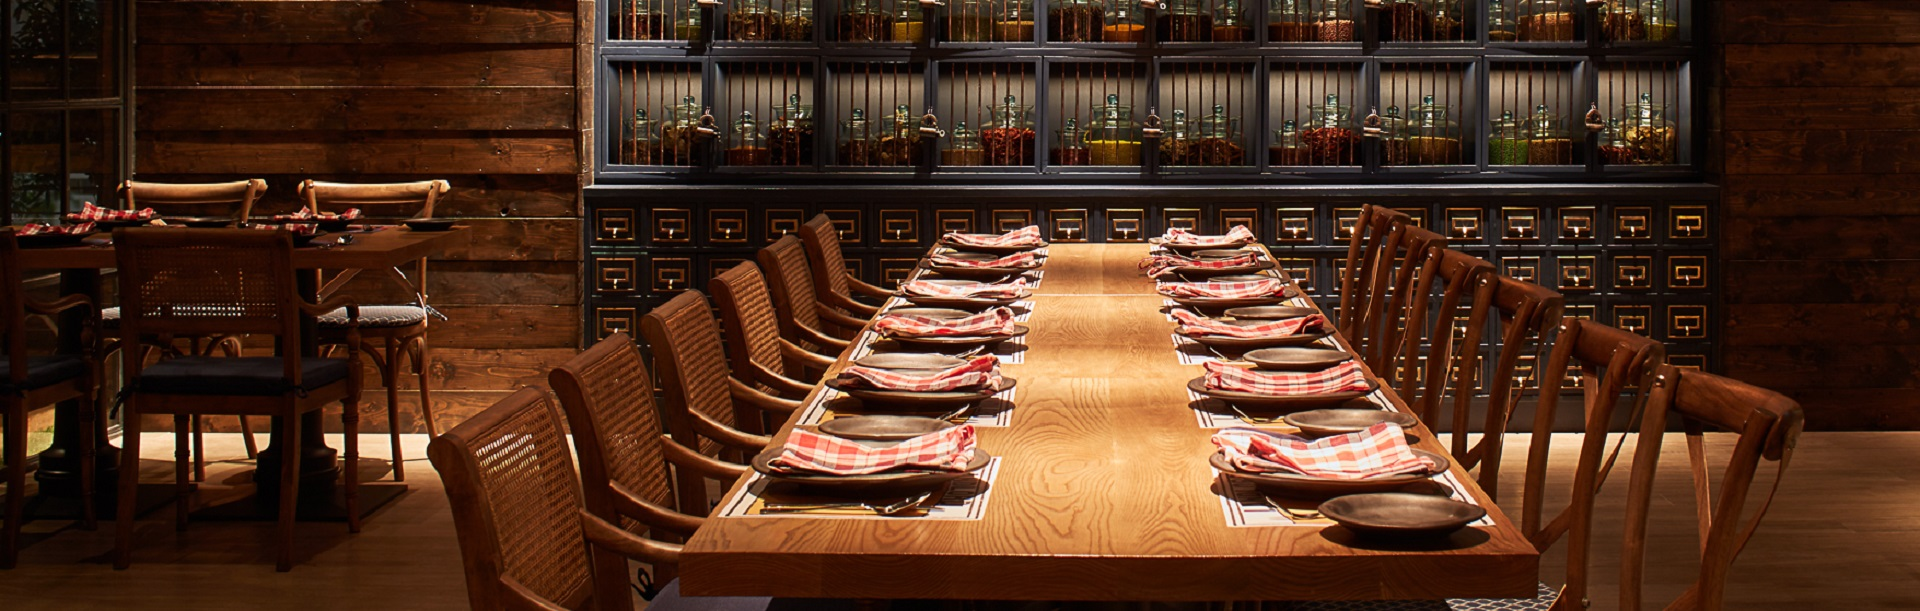 charcoal-tandoor-grill-mixology-hotel-hotel-design-bangkok-architecture-sohohospitality